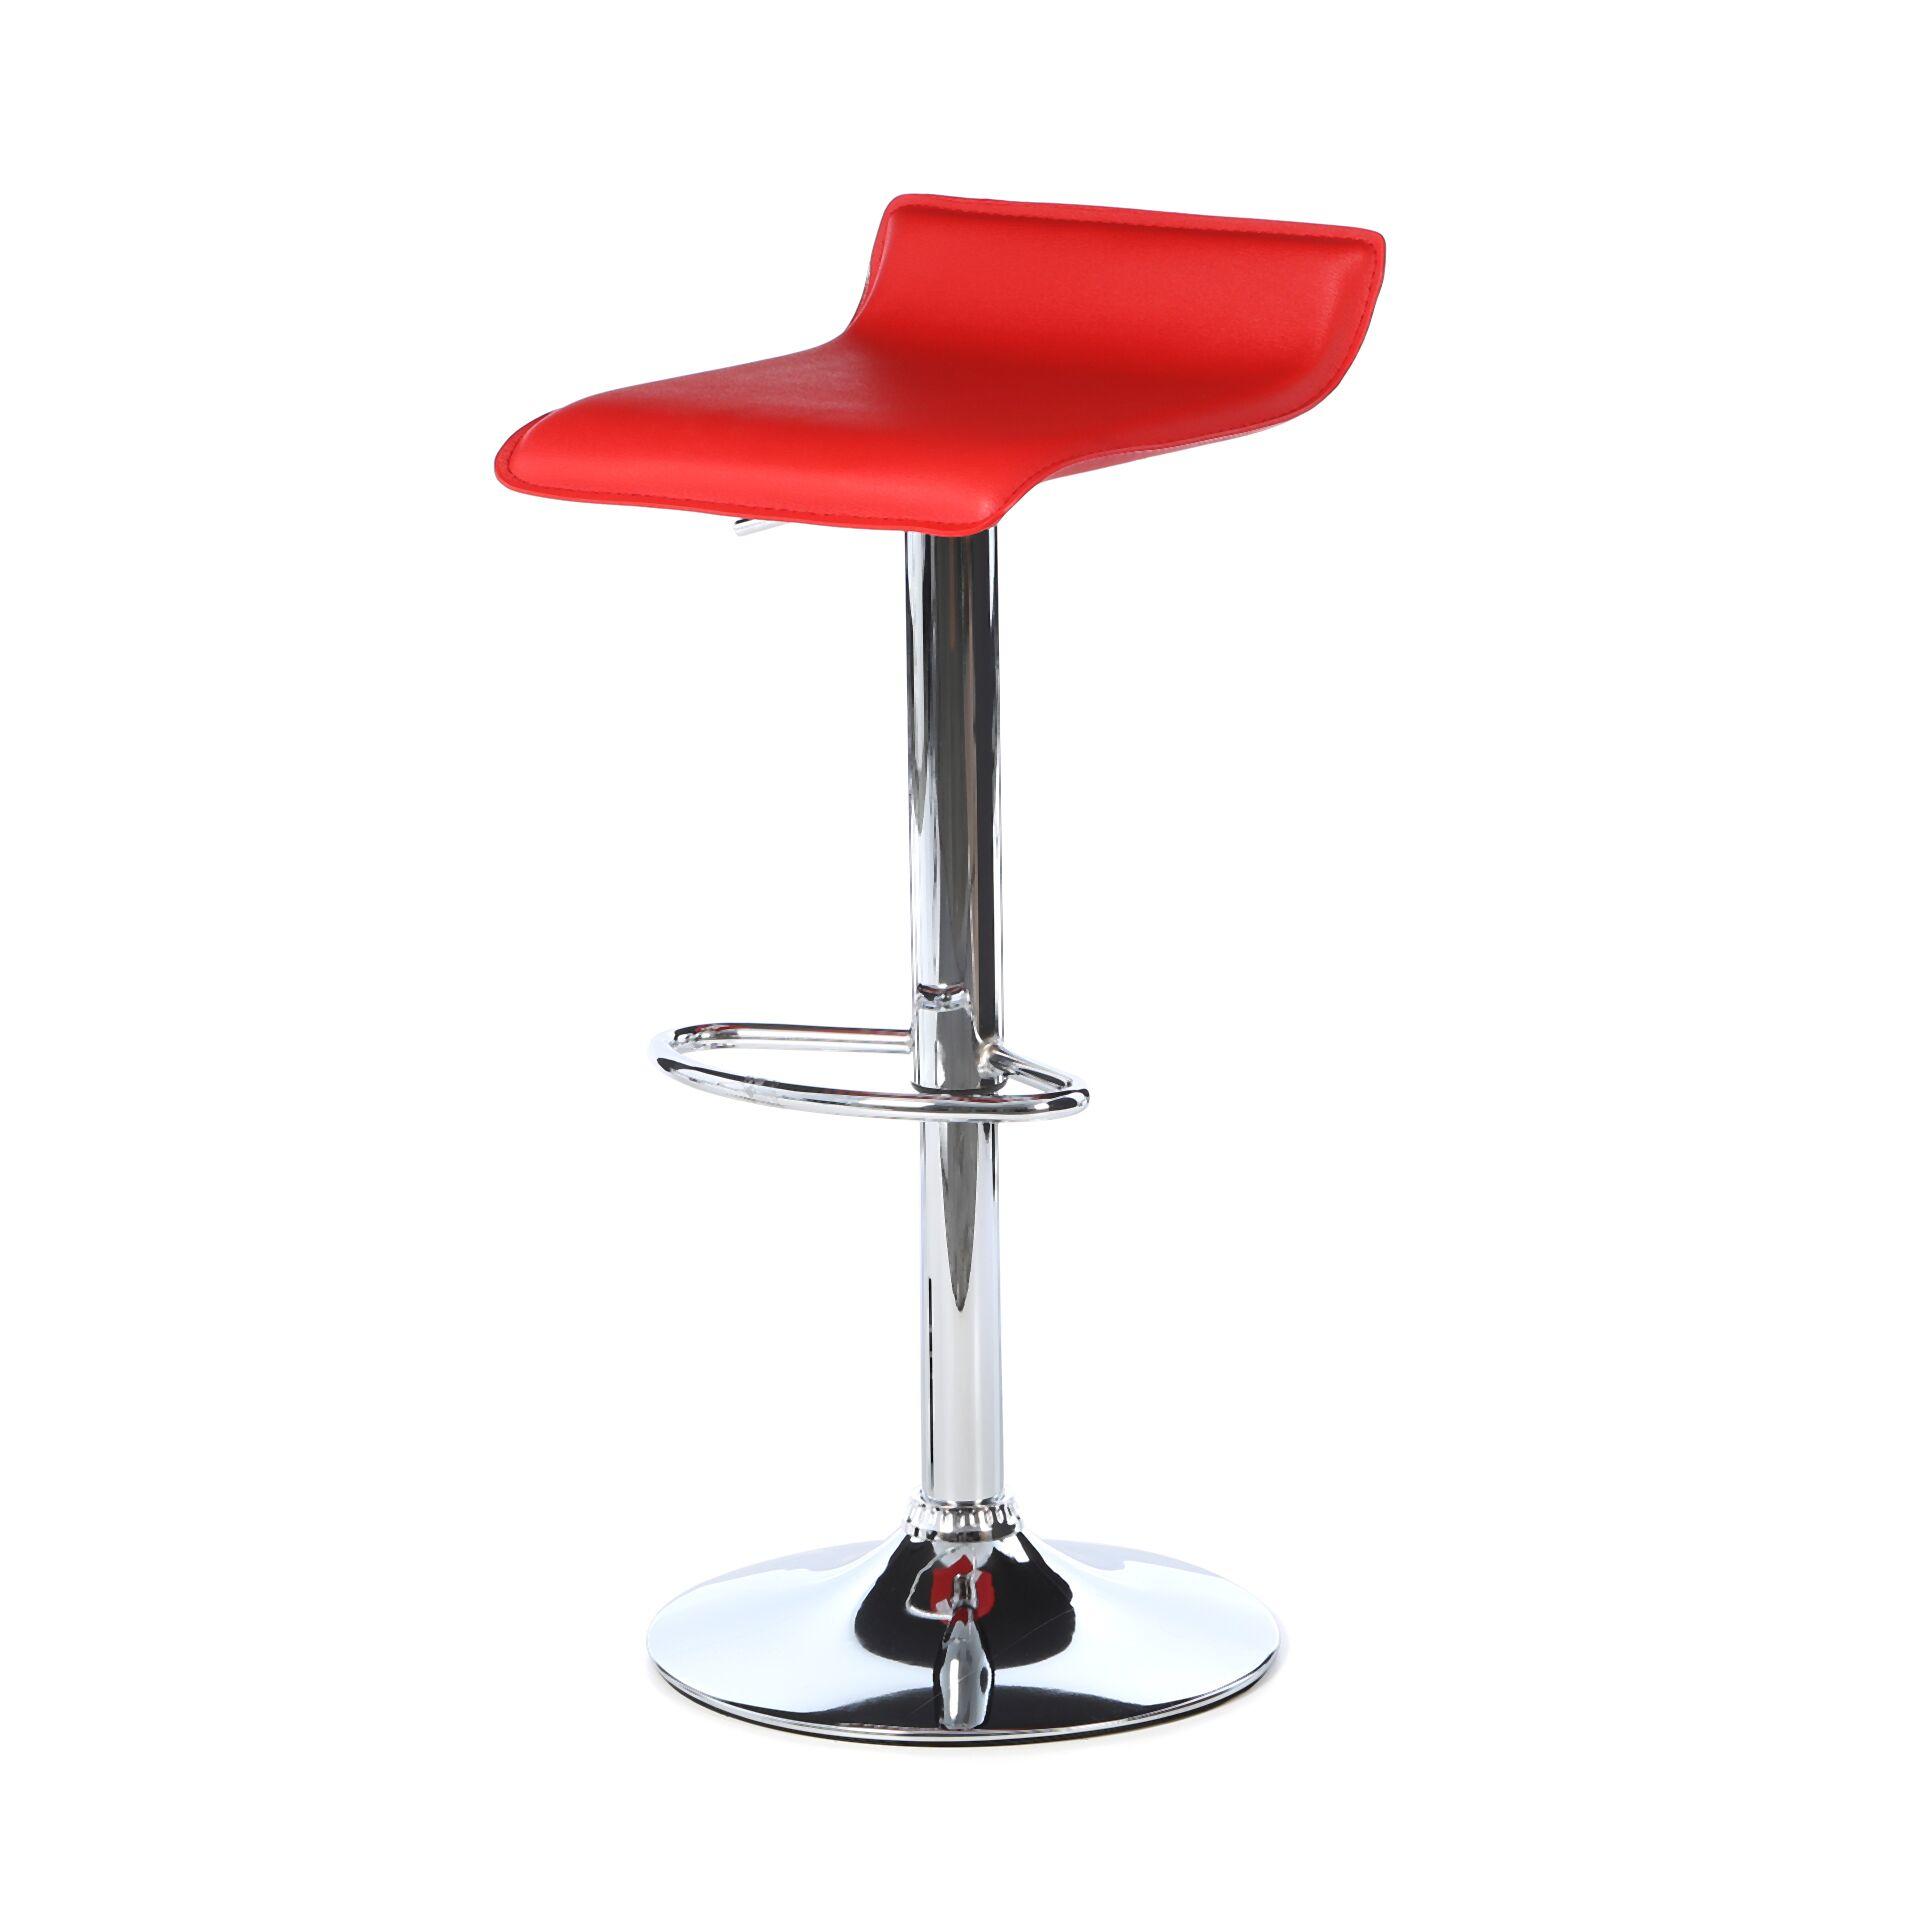 Wimberley Adjustable Height Swivel Bar Stool Upholstery: Red